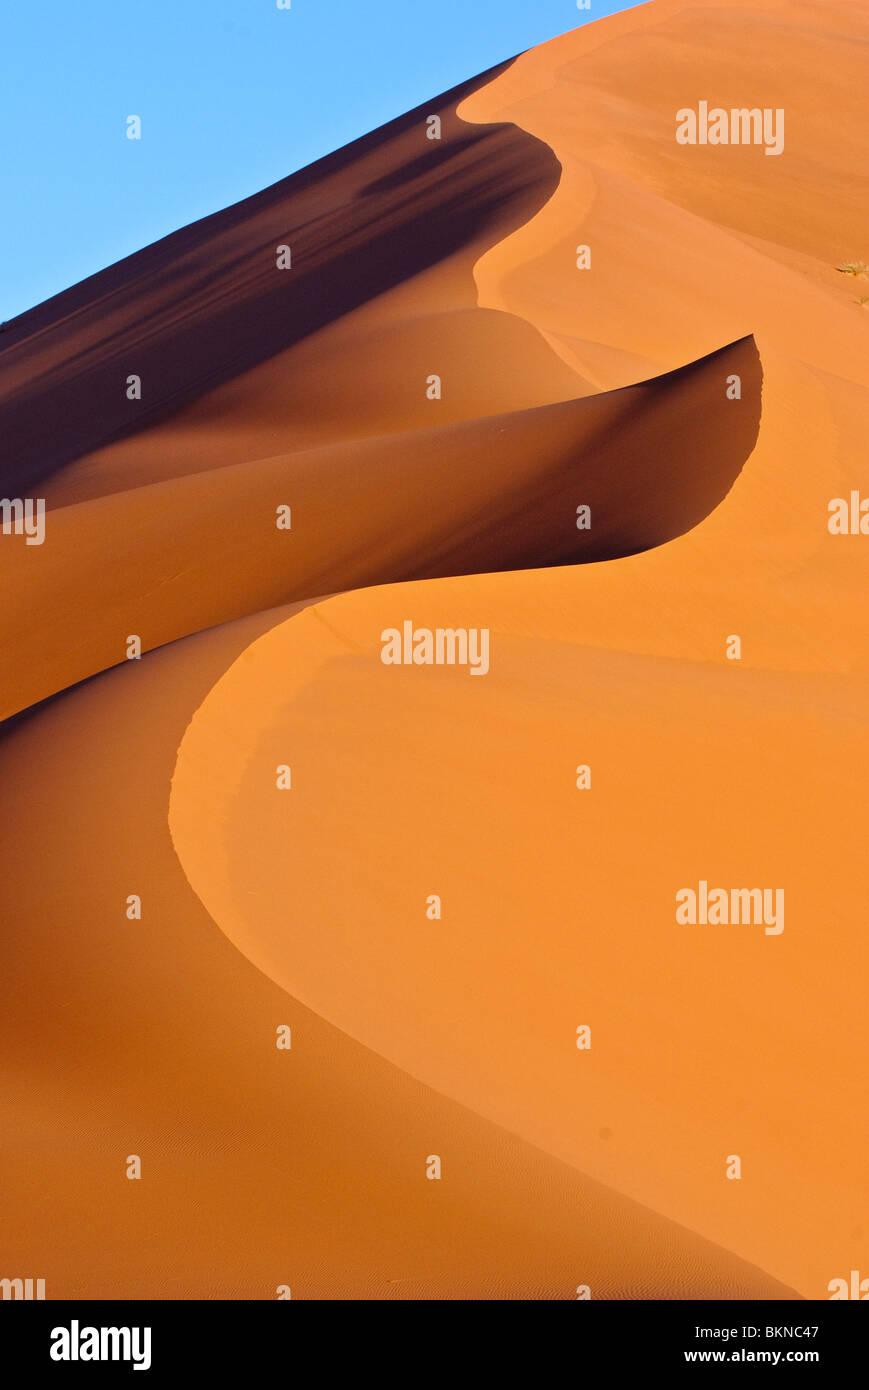 Sand dunes in the Sahara Desert, Morroco - Stock Image